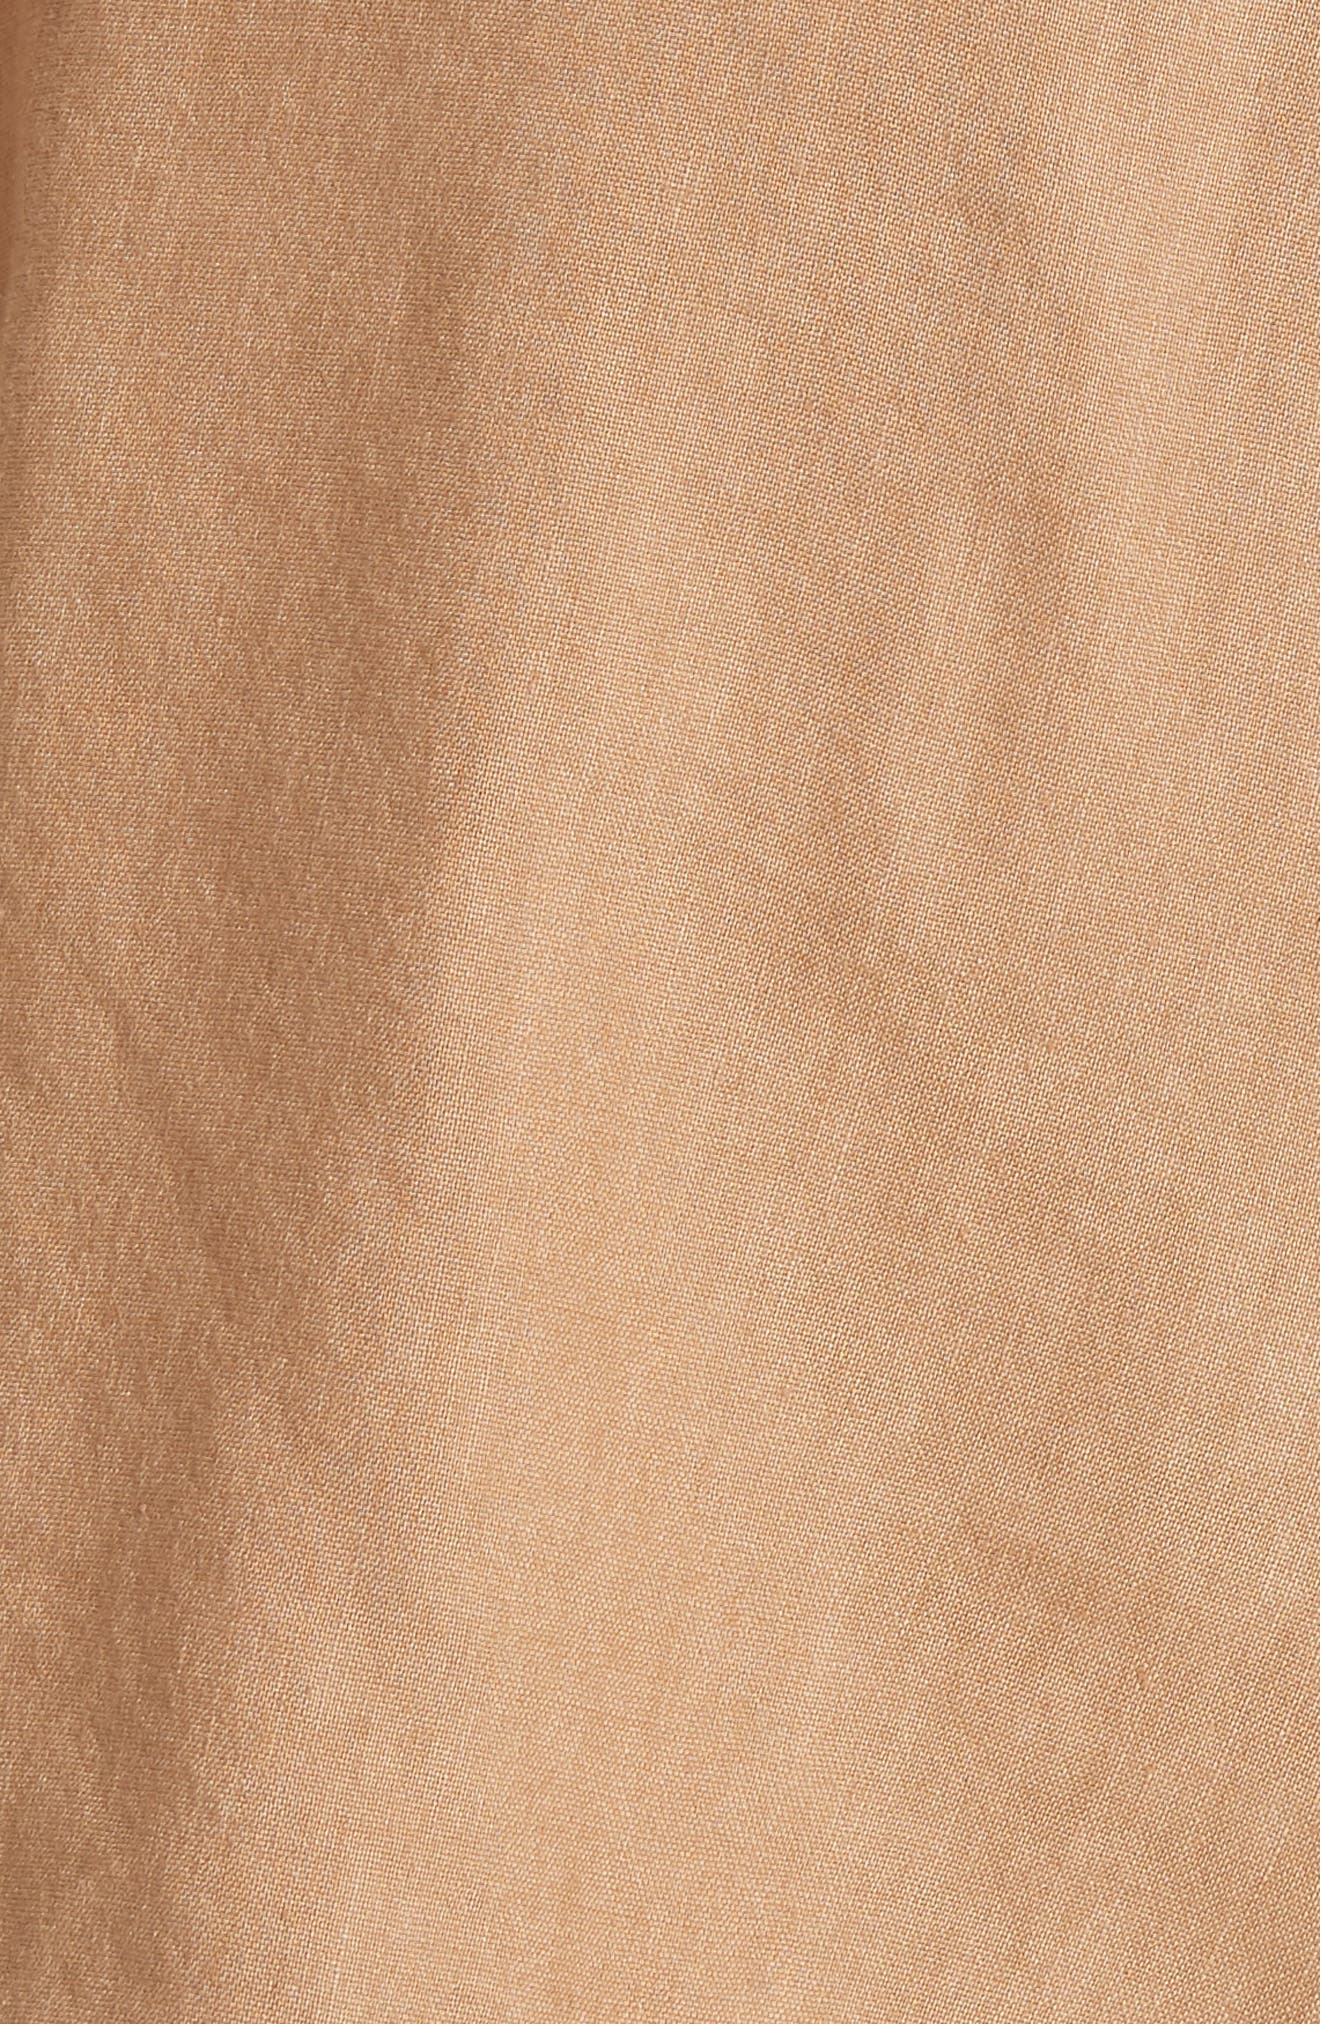 Dawson Flutter Tie Waist Linen Blend Shorts,                             Alternate thumbnail 5, color,                             Tan